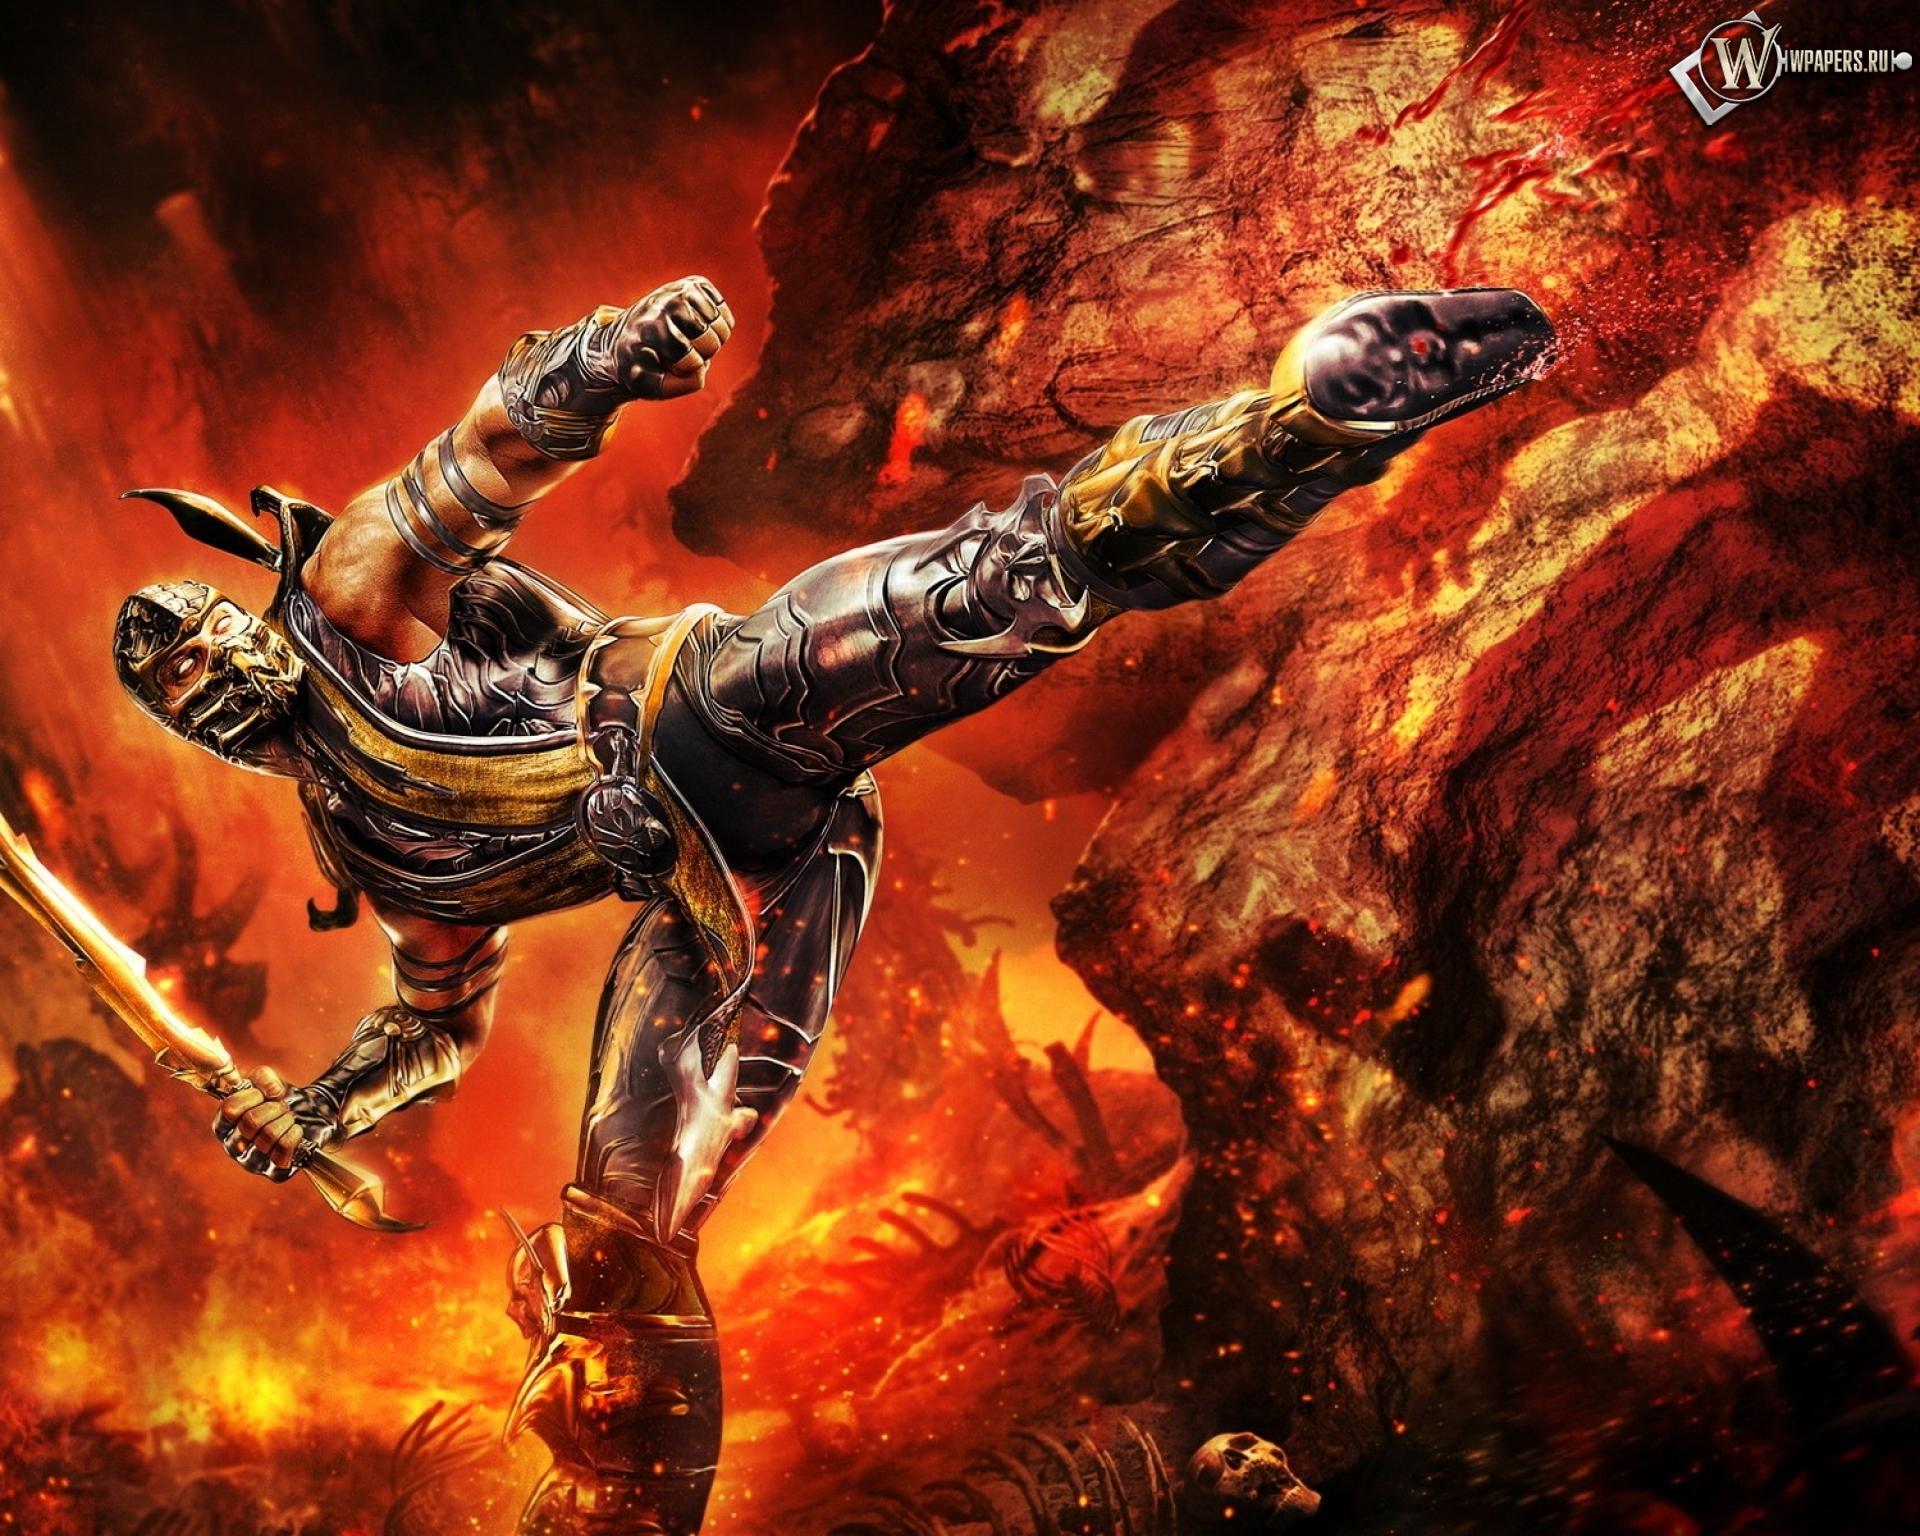 Mortal Kombat Обои На Рабочий Стол